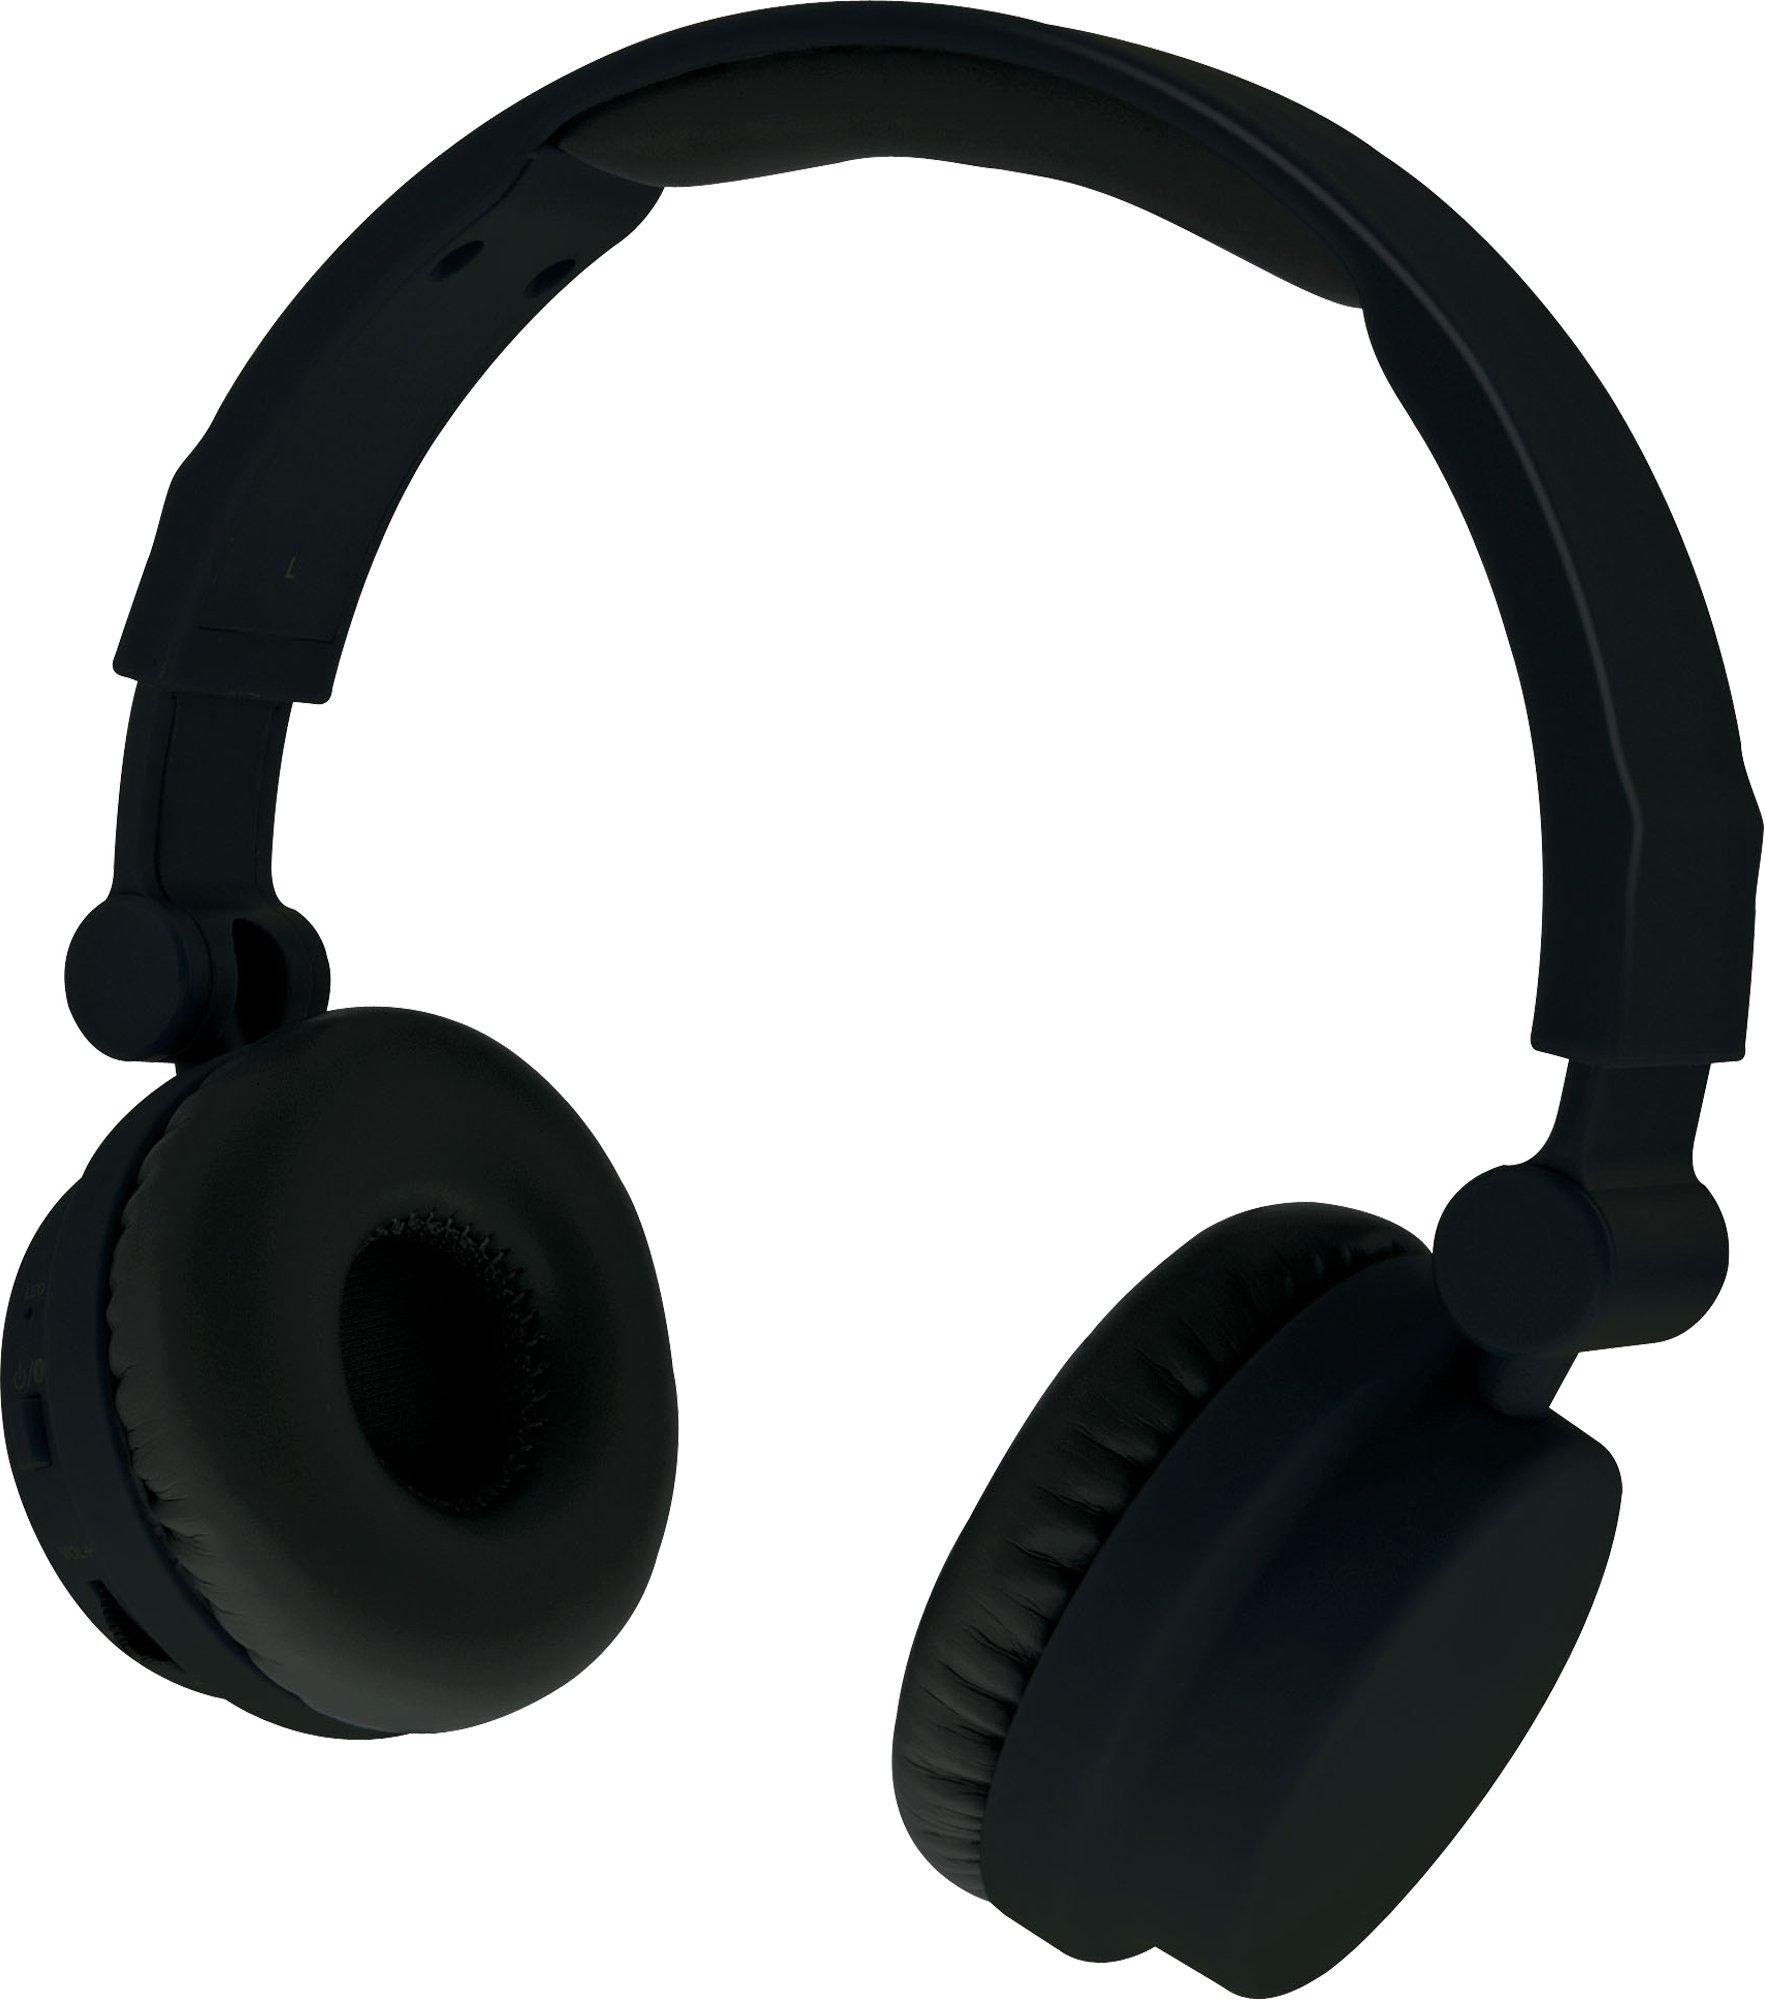 iLive iAHBT45B On-Ear Wireless Touch Headphones Matte Black